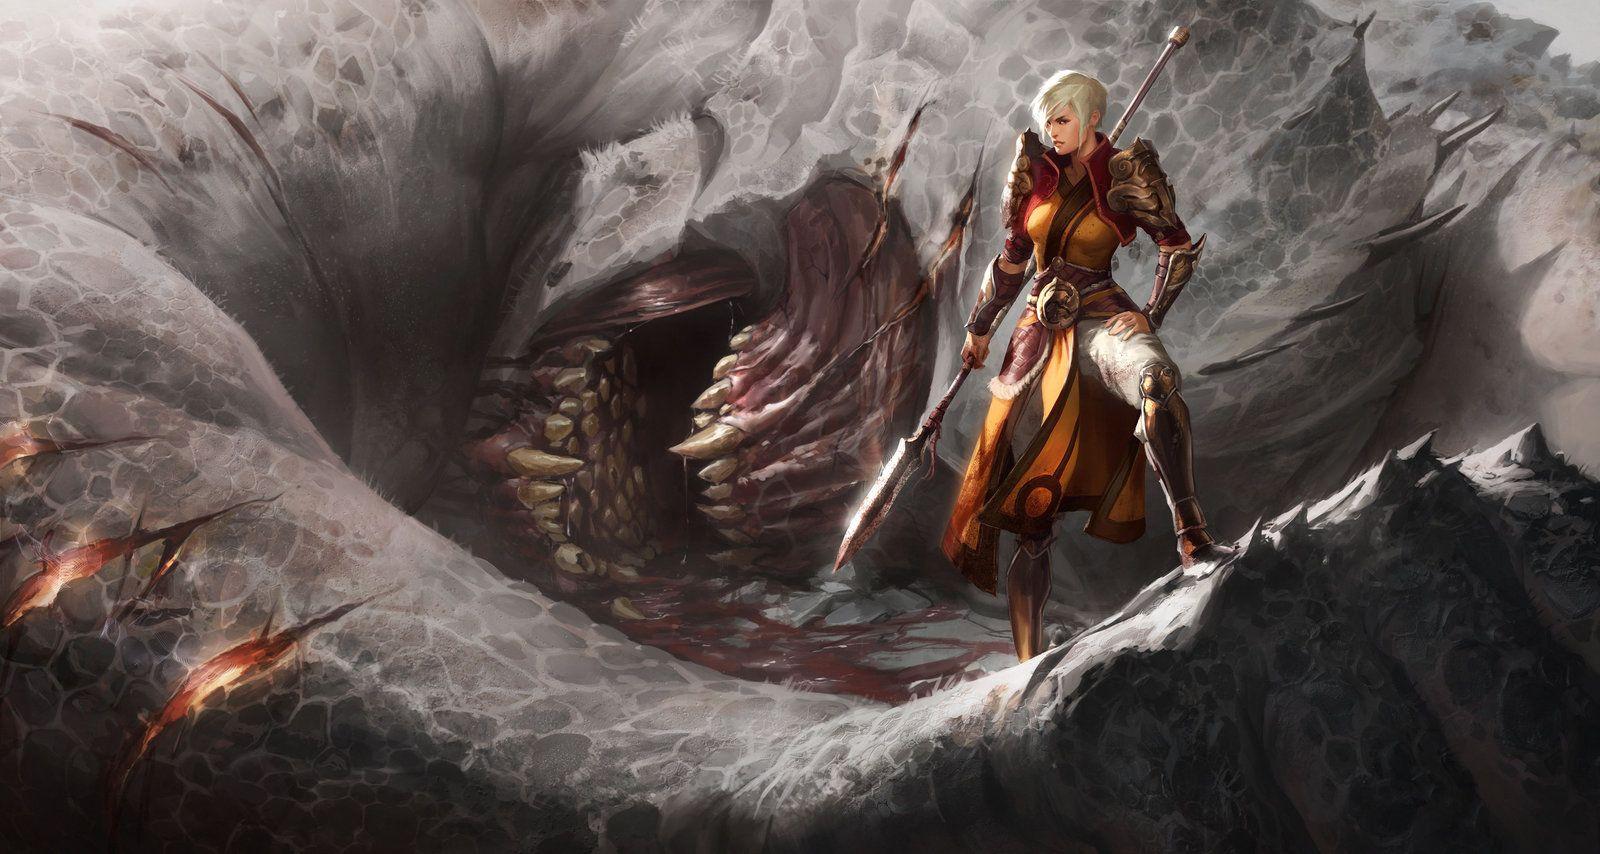 Another One Bites The Dust Female Monk Diablo 3 Games Wallpapers Art Digital Art Fantasy Fantasy Art